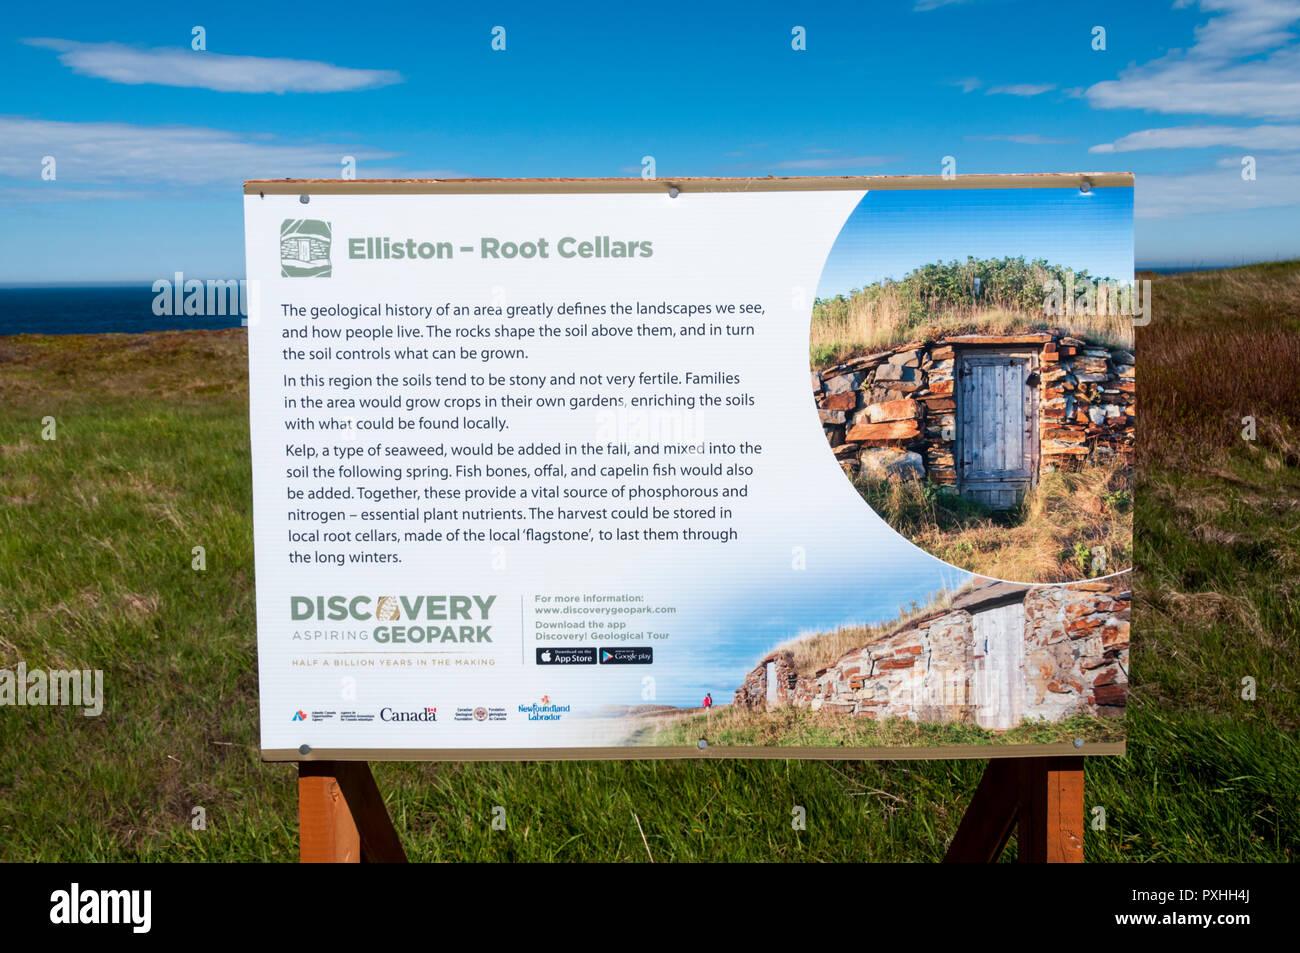 Interpretive sign about Elliston root cellars, Newfoundland. - Stock Image